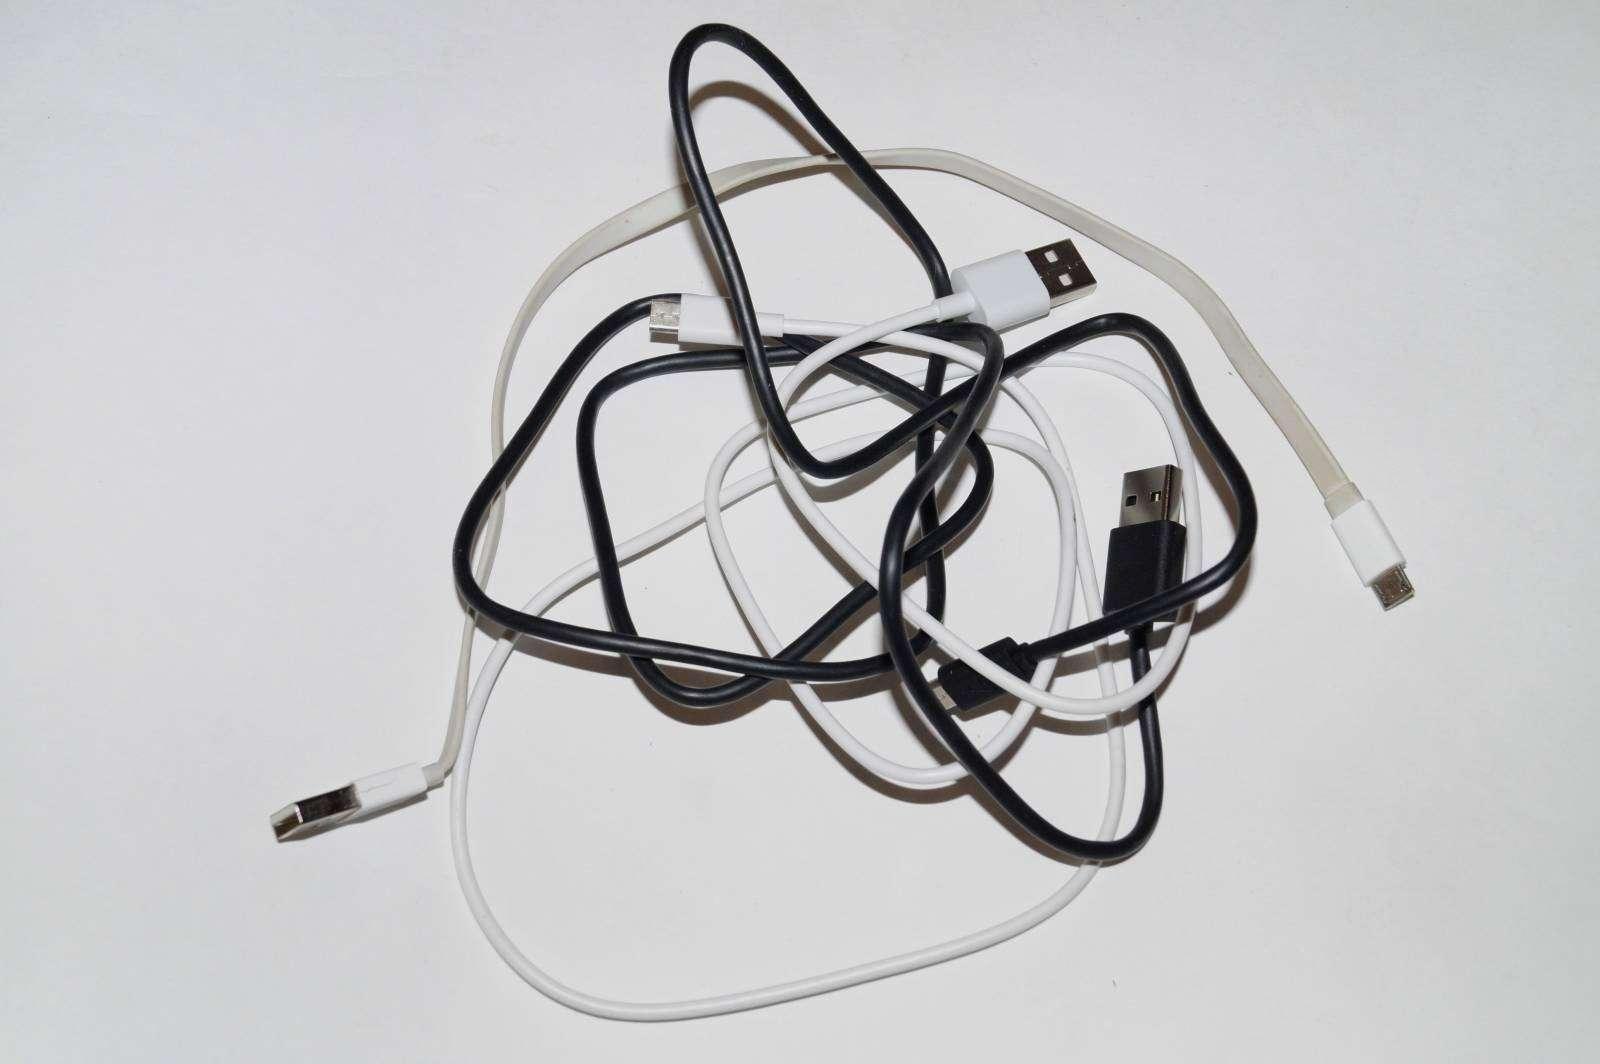 Aliexpress: Micro USB кабель фирмы CHOETECH, длиной 1 метр.